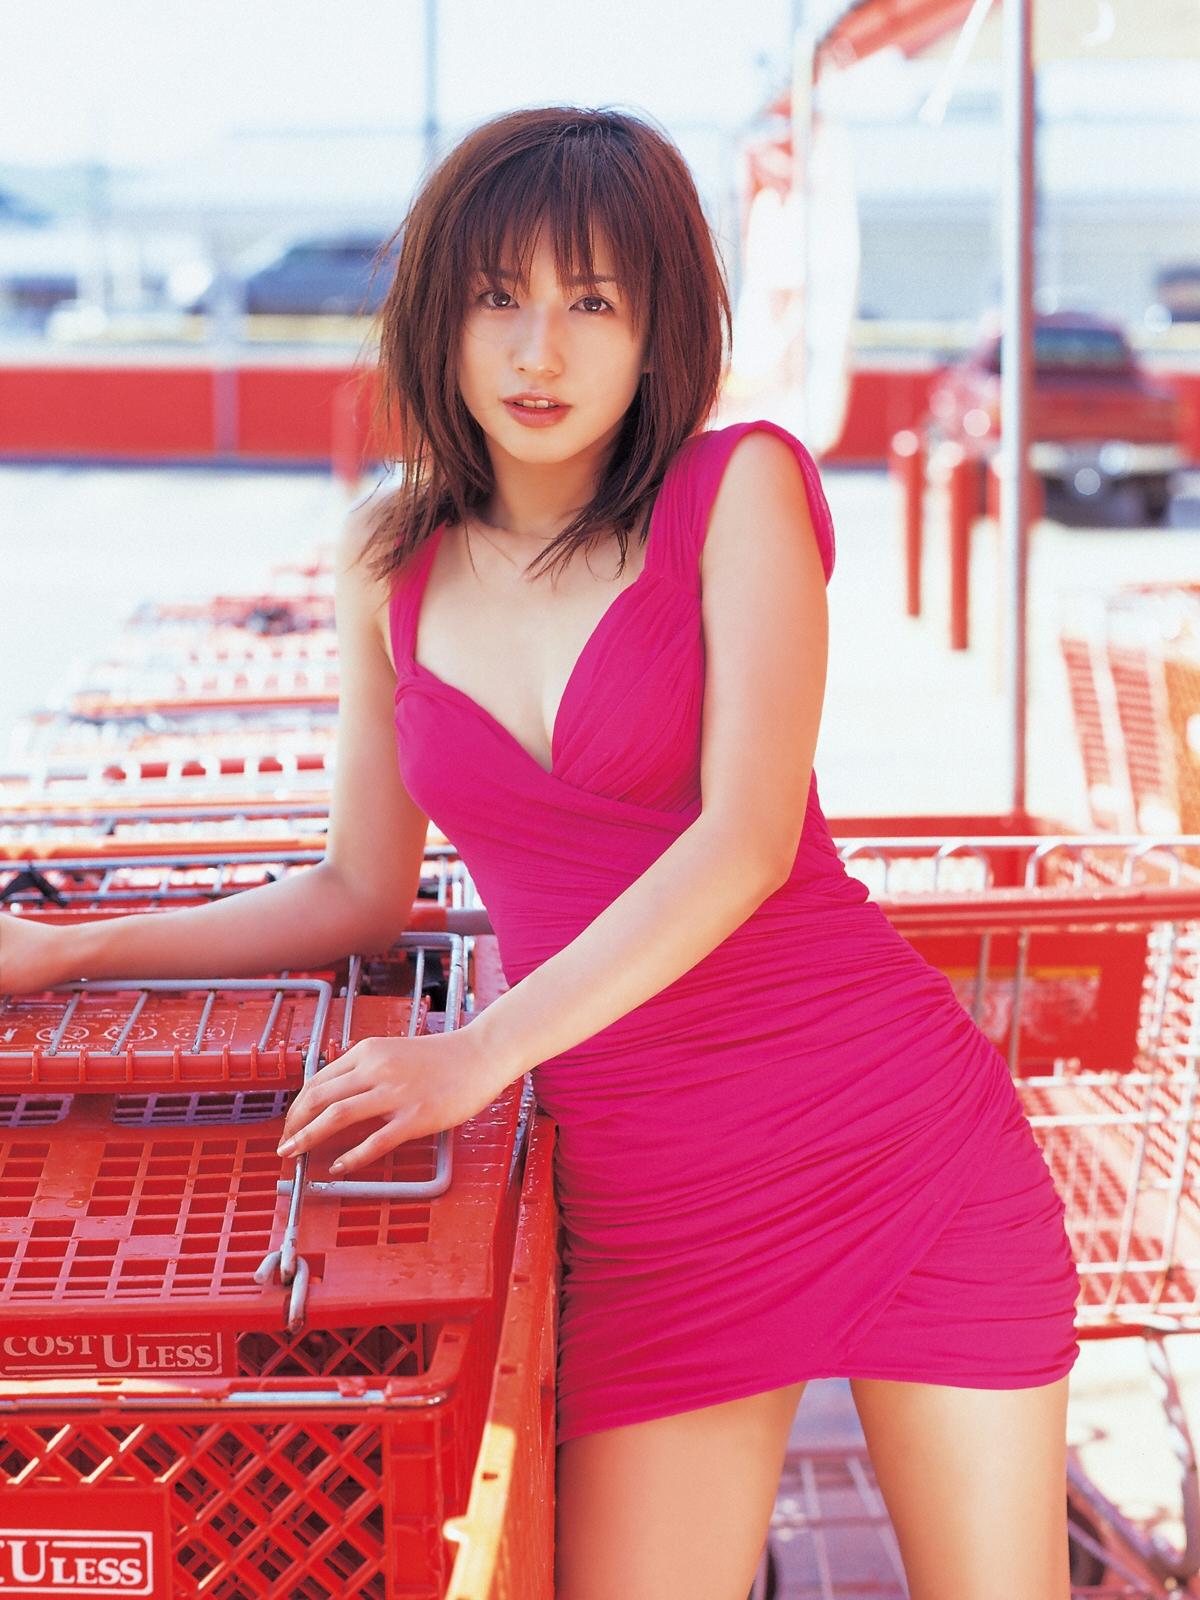 [HF/UPL] Maomi Yuuki - Sabra.net 優木まおみ [2008.03][28.0 MB] hfupl 07280